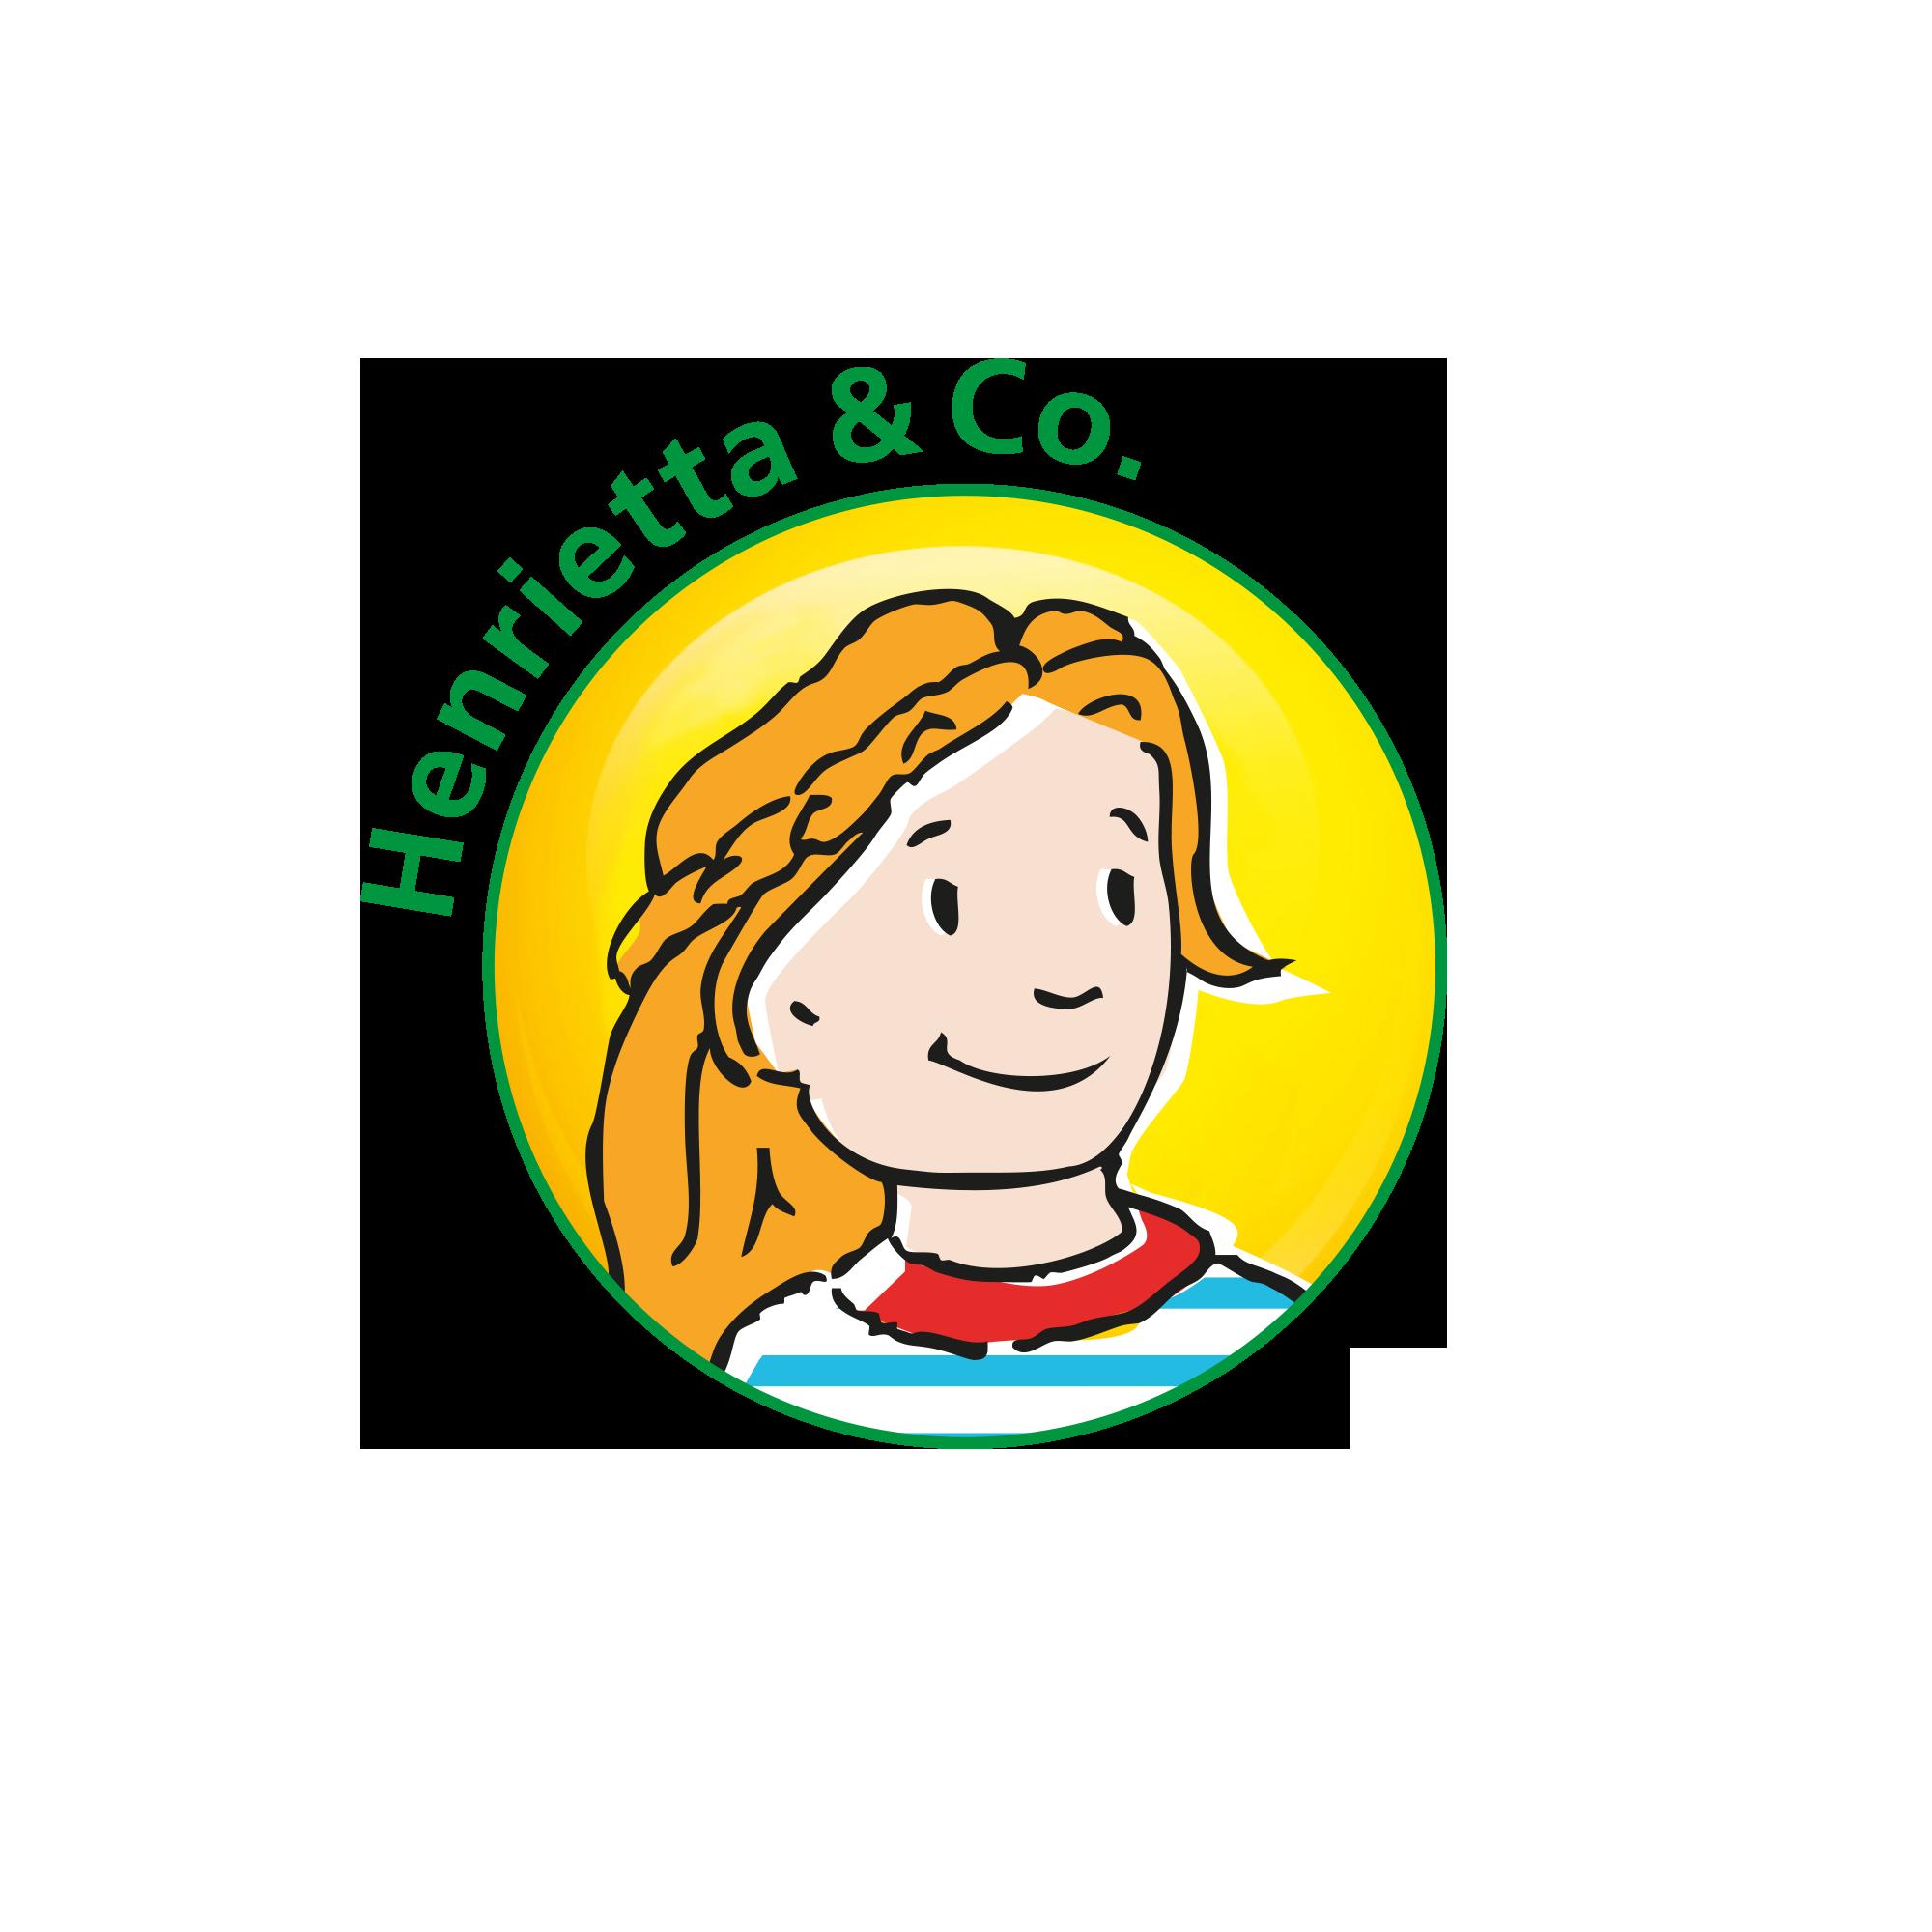 Henrietta & Co. Logo